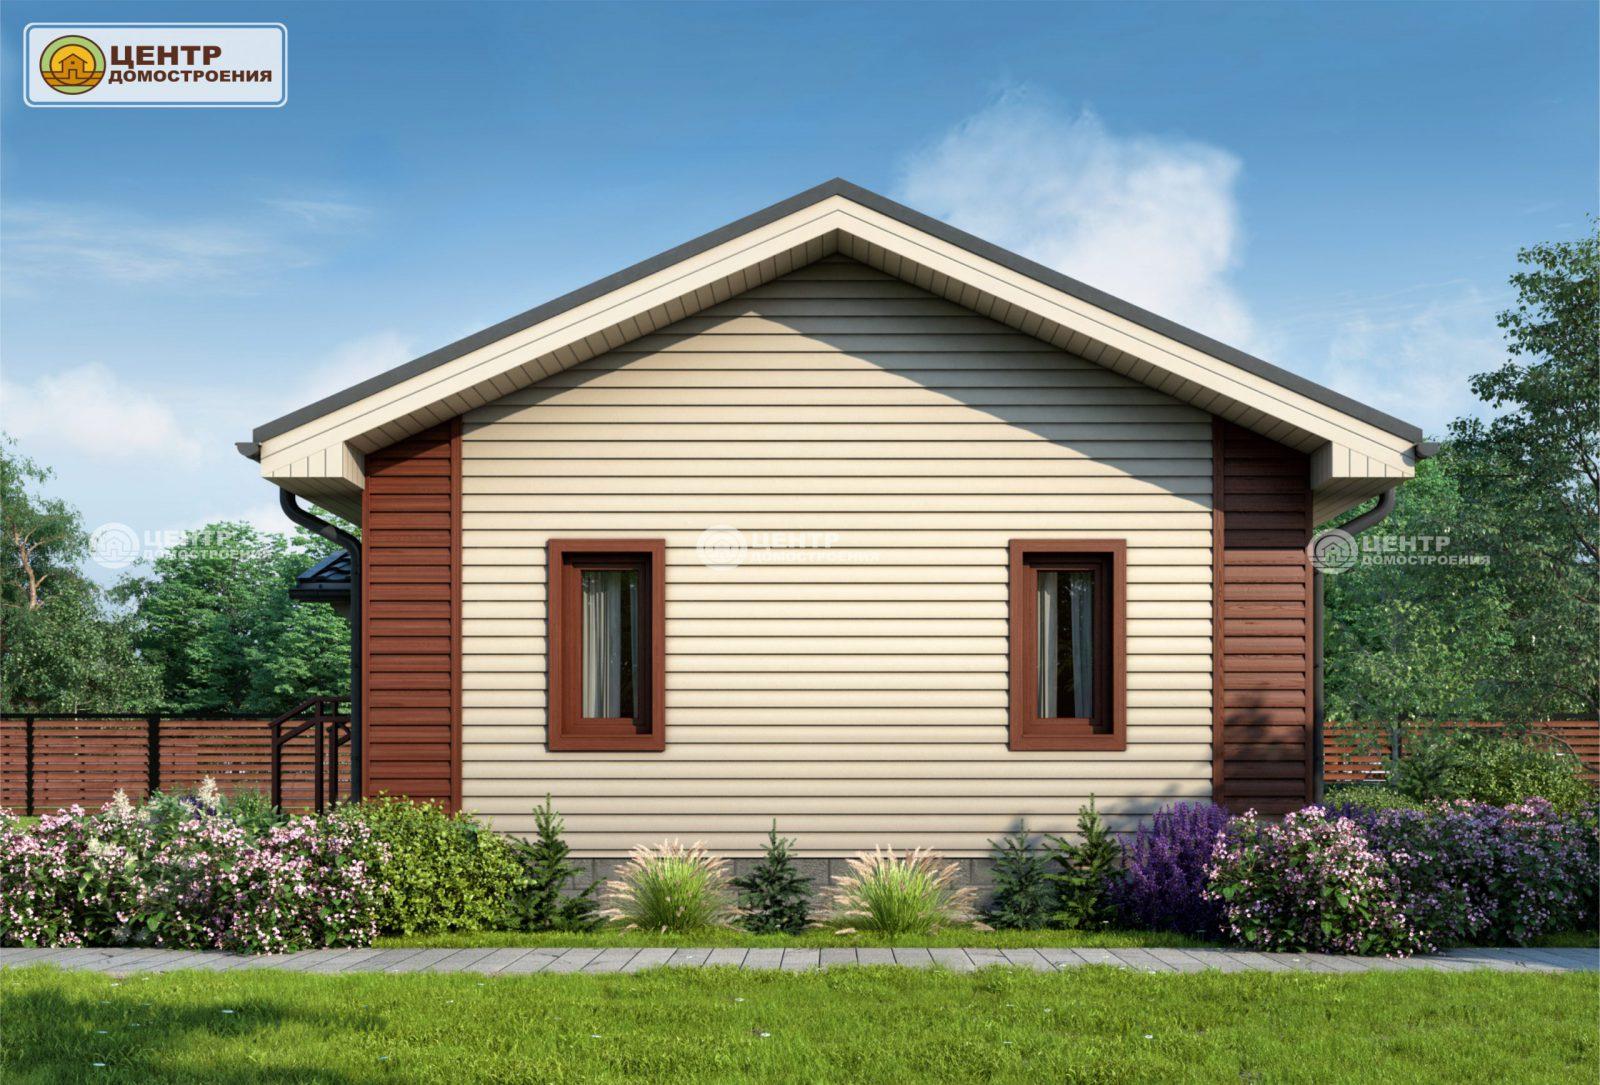 Проект одноэтажного дома 6 на 8